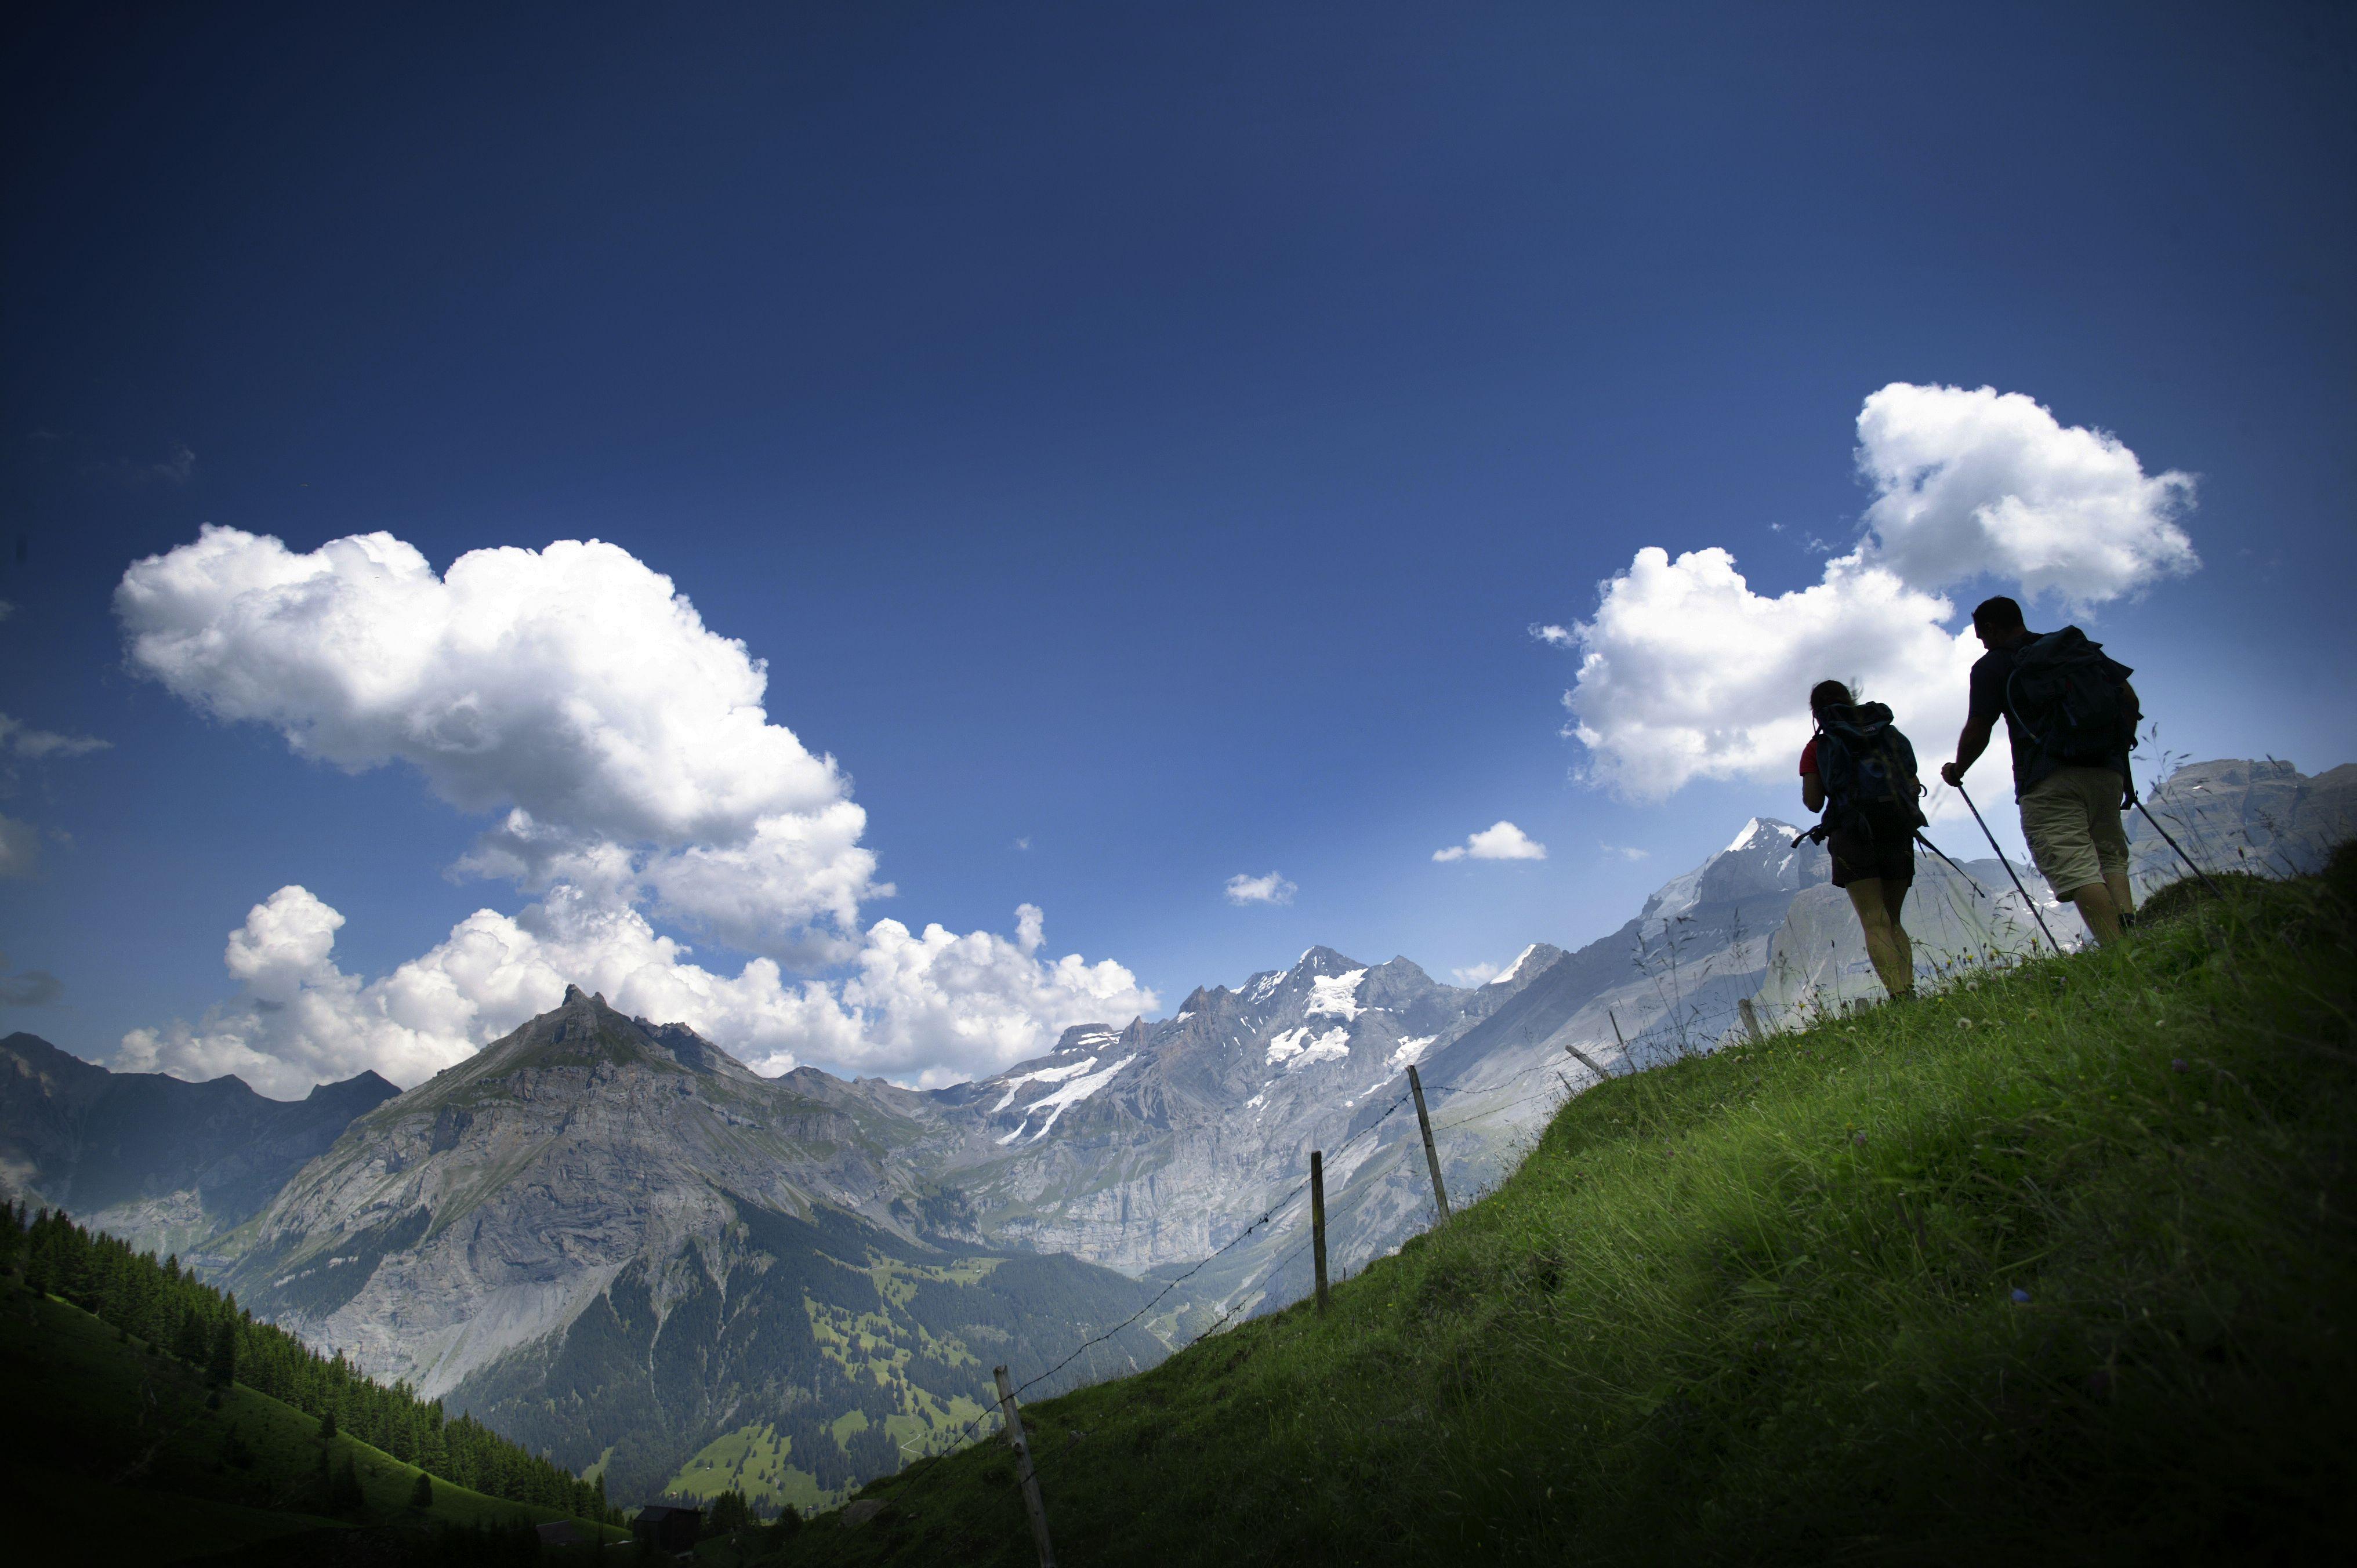 Klettersteig Allmenalp : Willkommen bei der luftseilbahn kandersteg allmenalp